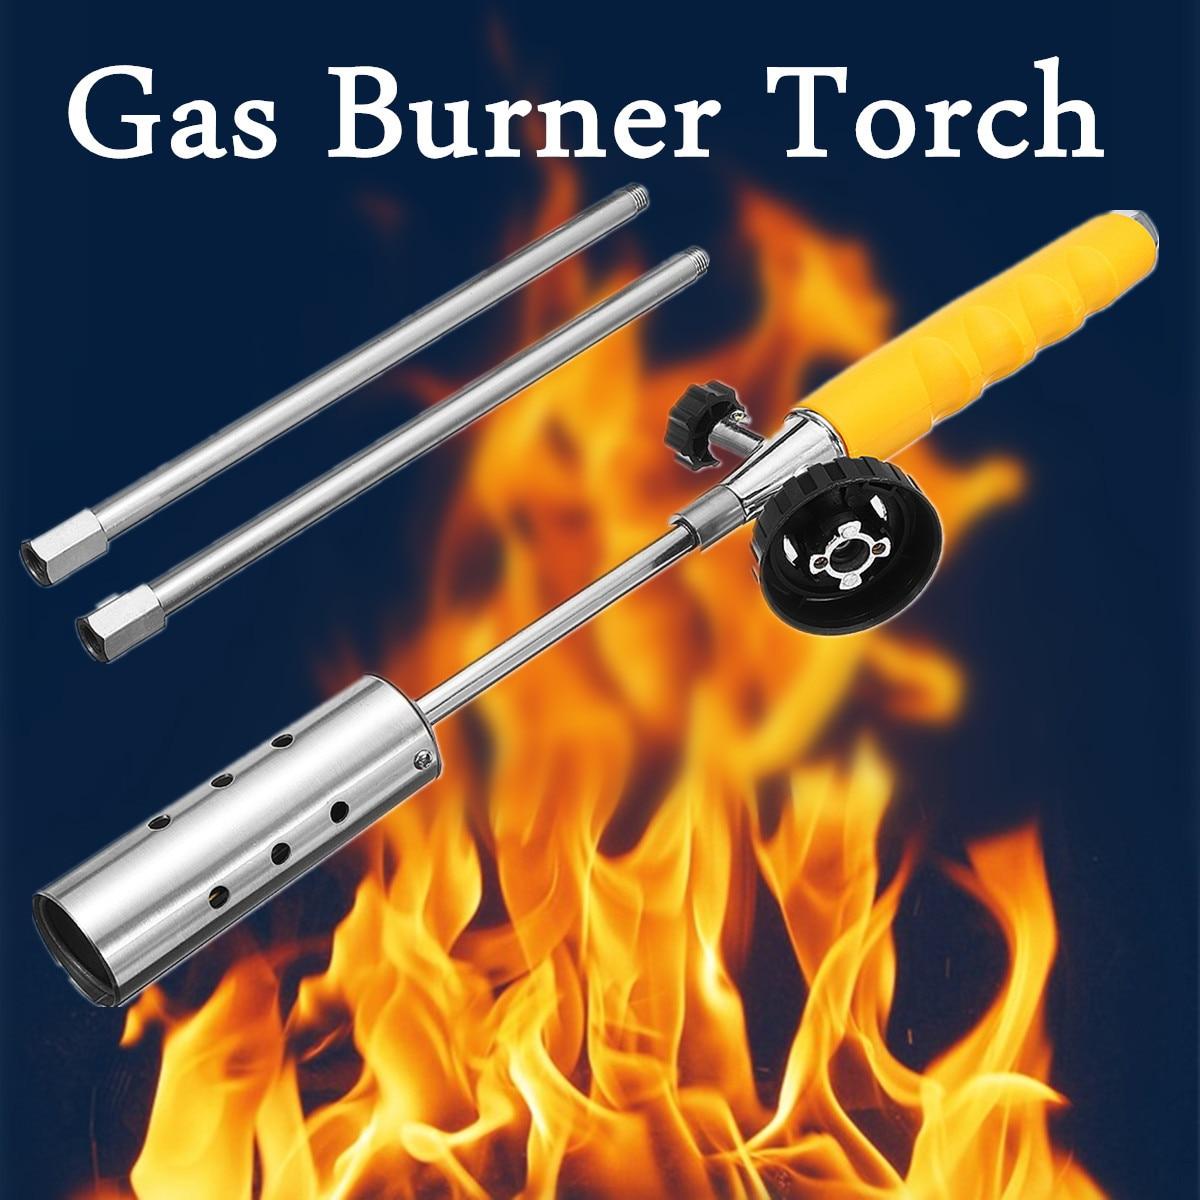 Weed Killer Grass Shrub Garden Kill Burner Kit Handle Butane Gas Torch with 2 x ExtensionPole Stainless Steel Spray цена